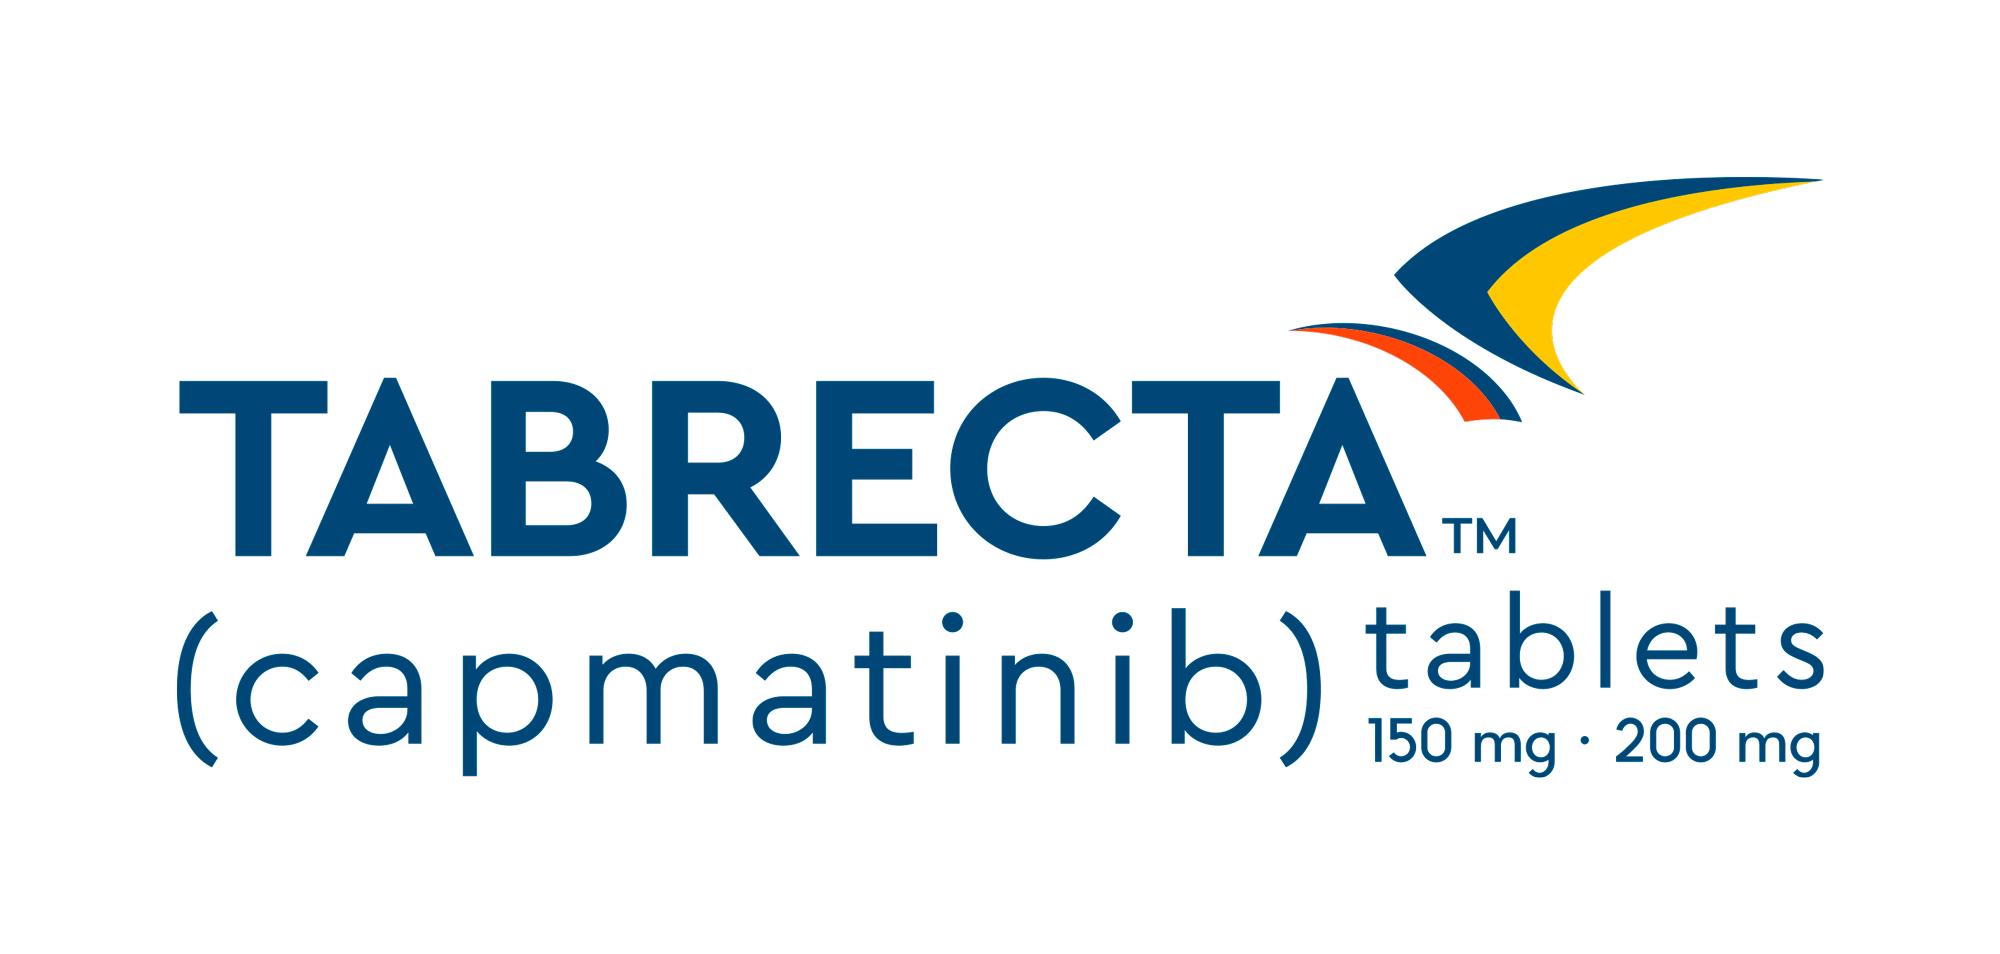 «Табректа» (Tabrecta, капматиниб).